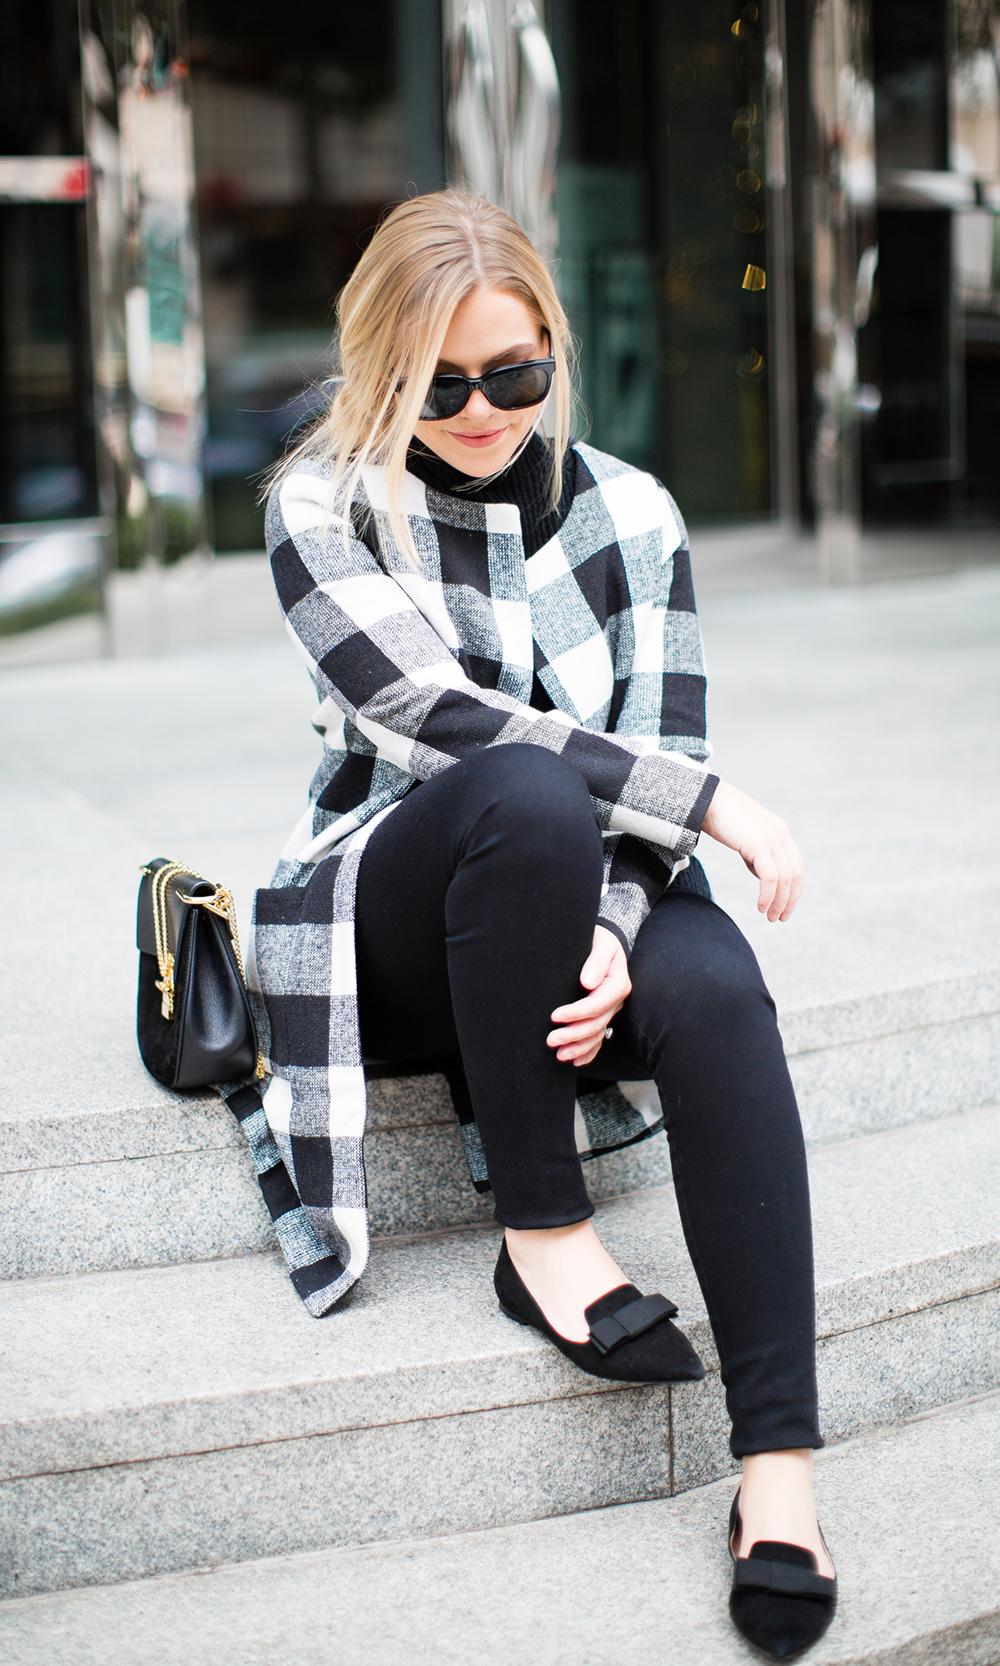 Black + White Checkered Jacket